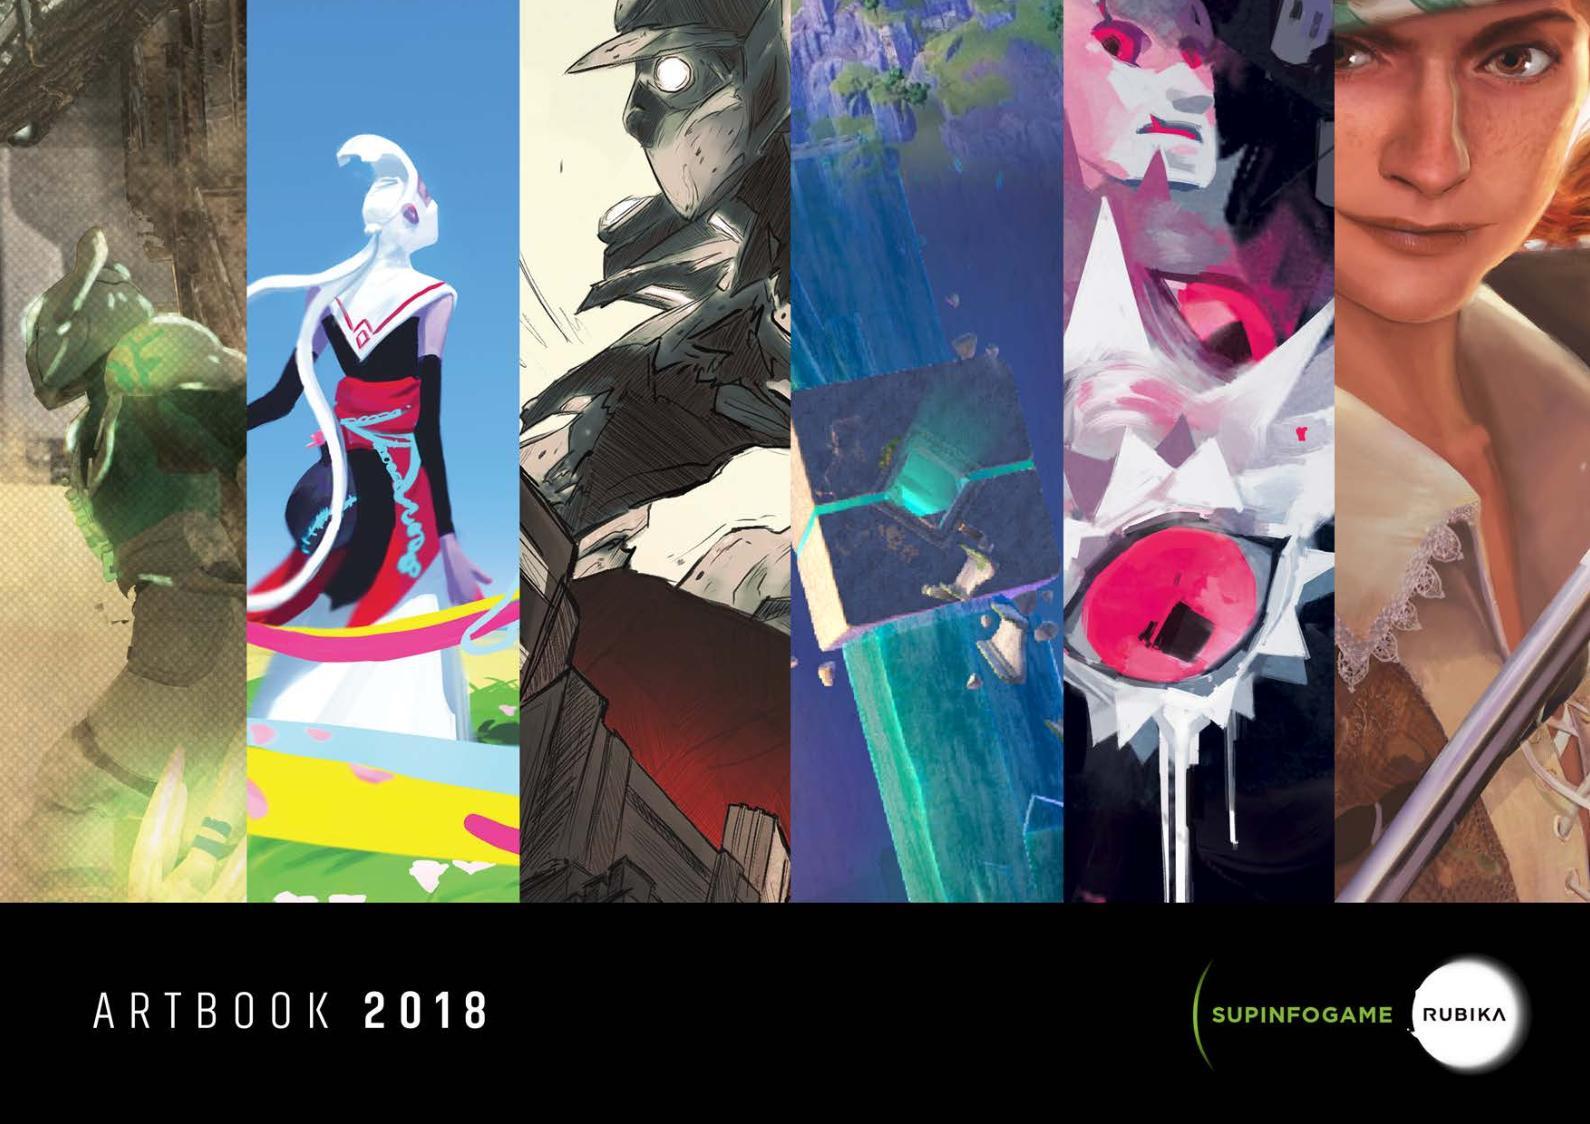 Artbook rubika supinfogame 2018 calameo downloader download malvernweather Images